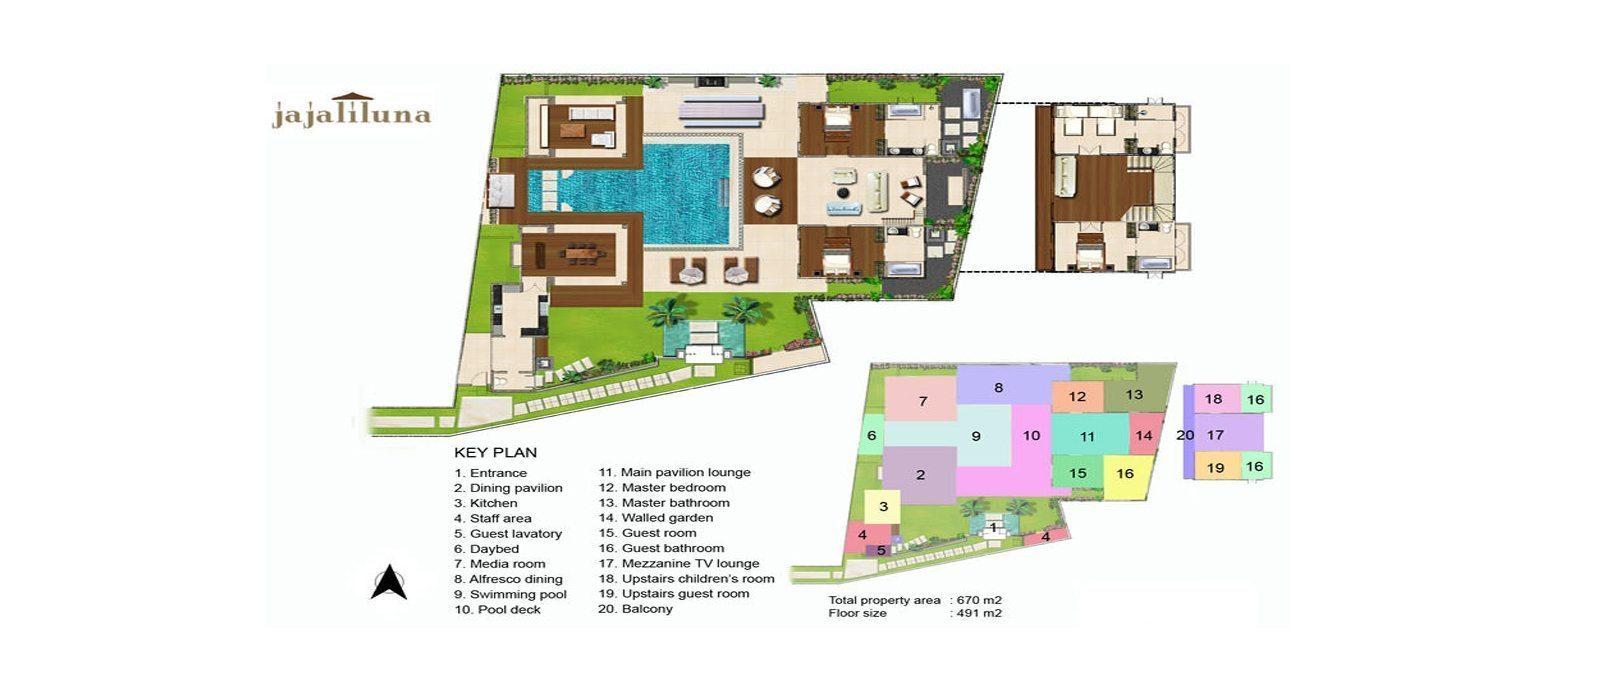 Villa Jajaliluna Floorplan | Seminyak, Bali